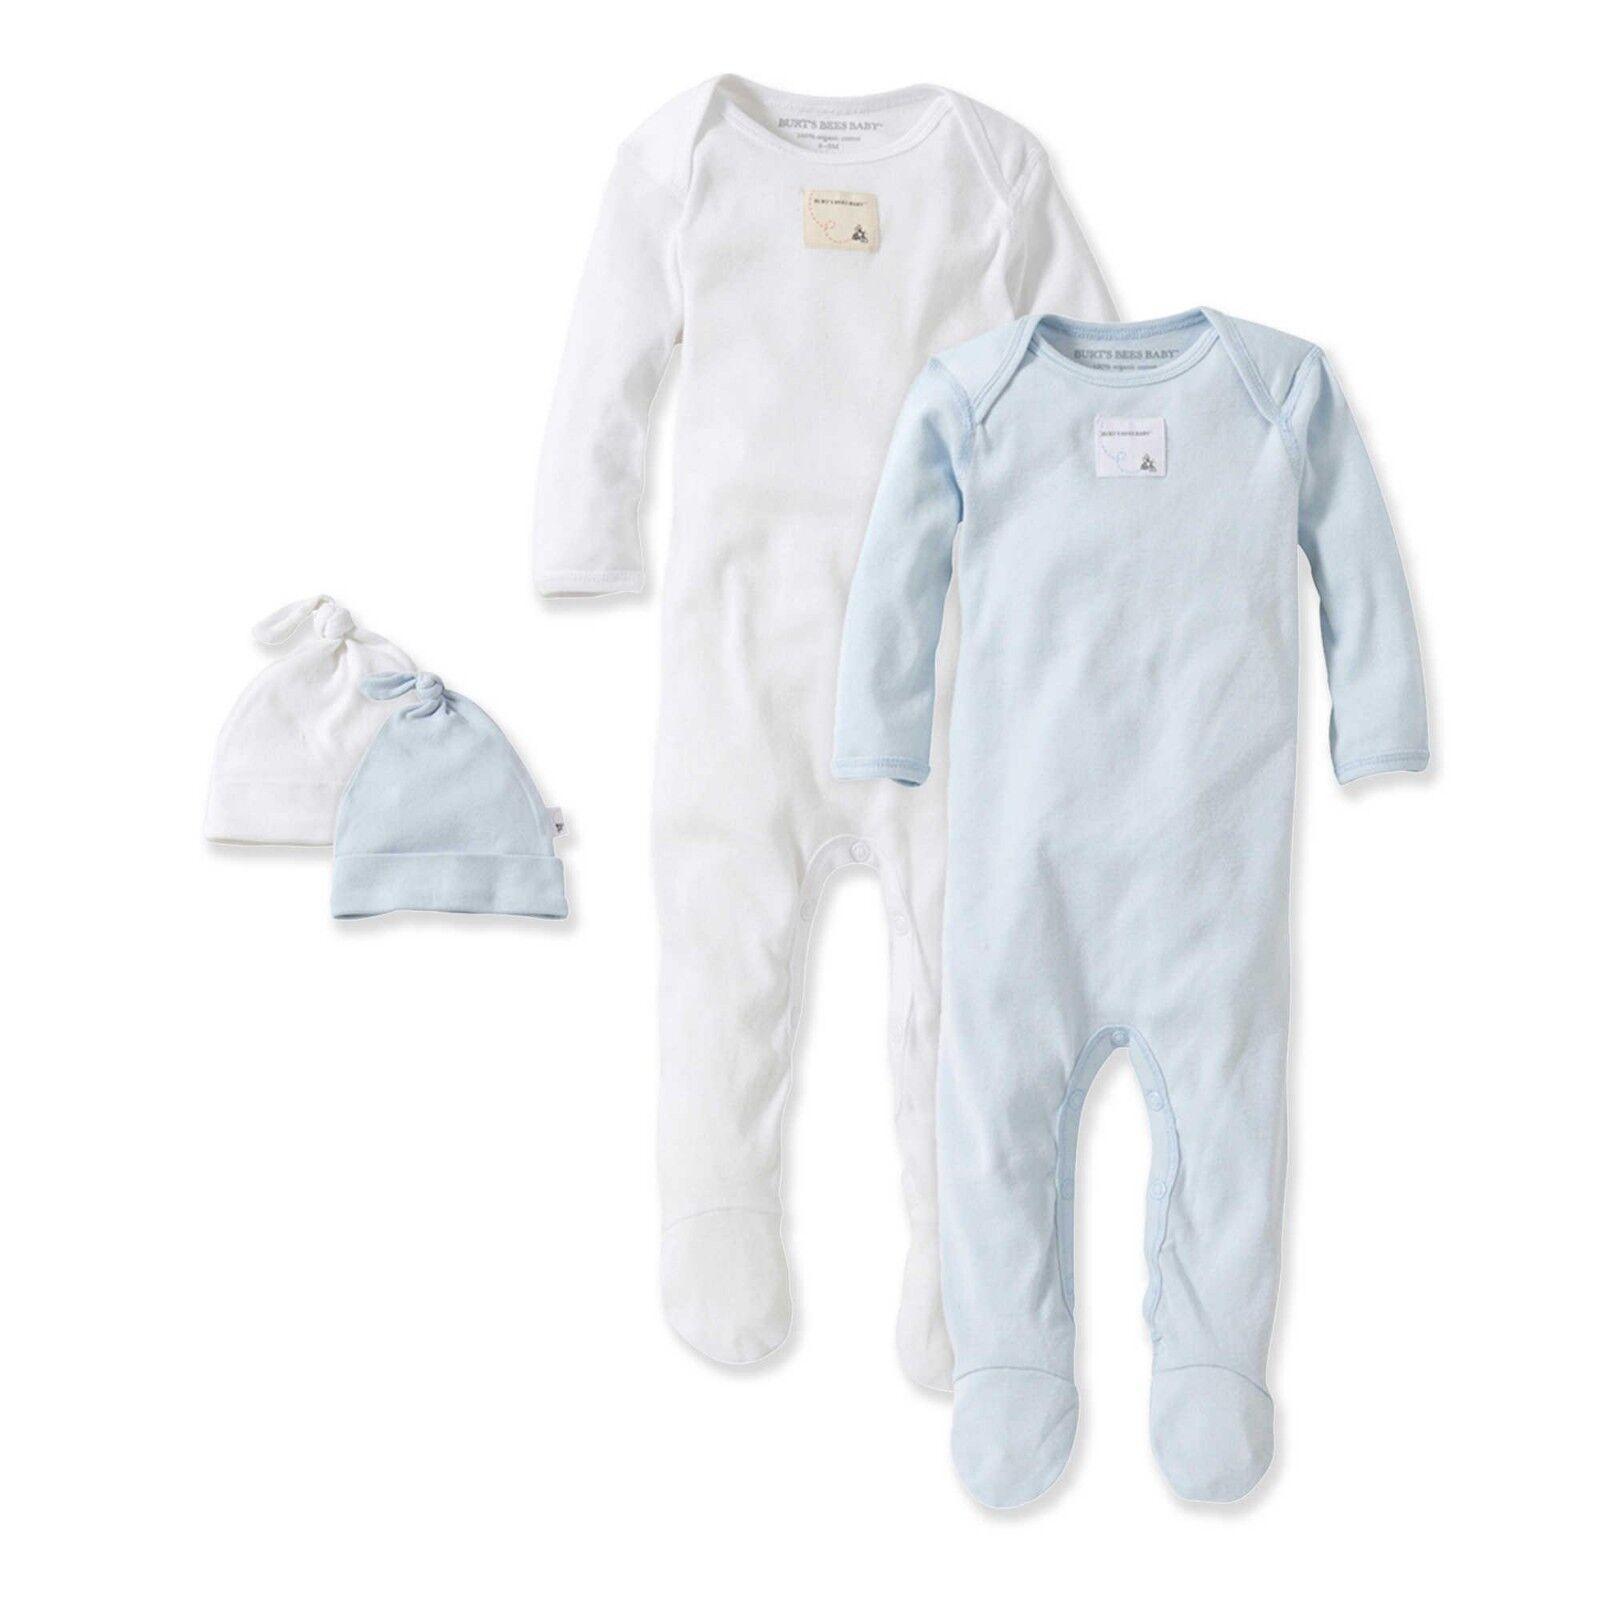 Burt's Bees Baby Organic Cotton Preemie Coverall & Hat Sets: